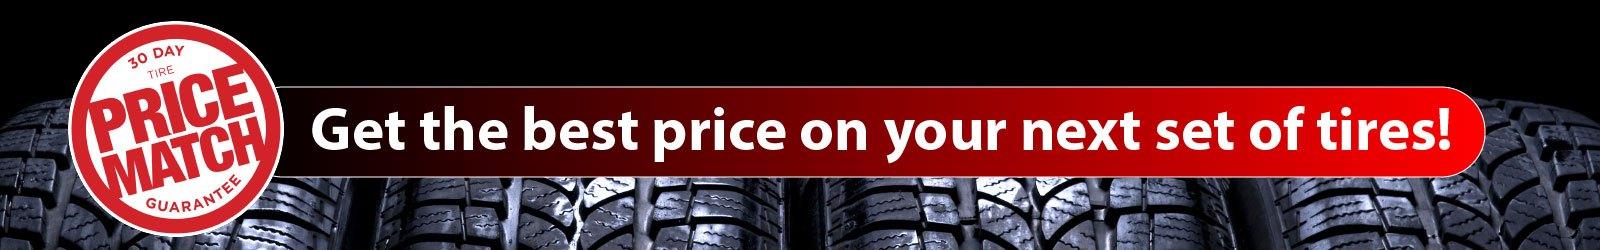 Price-Match-Banner